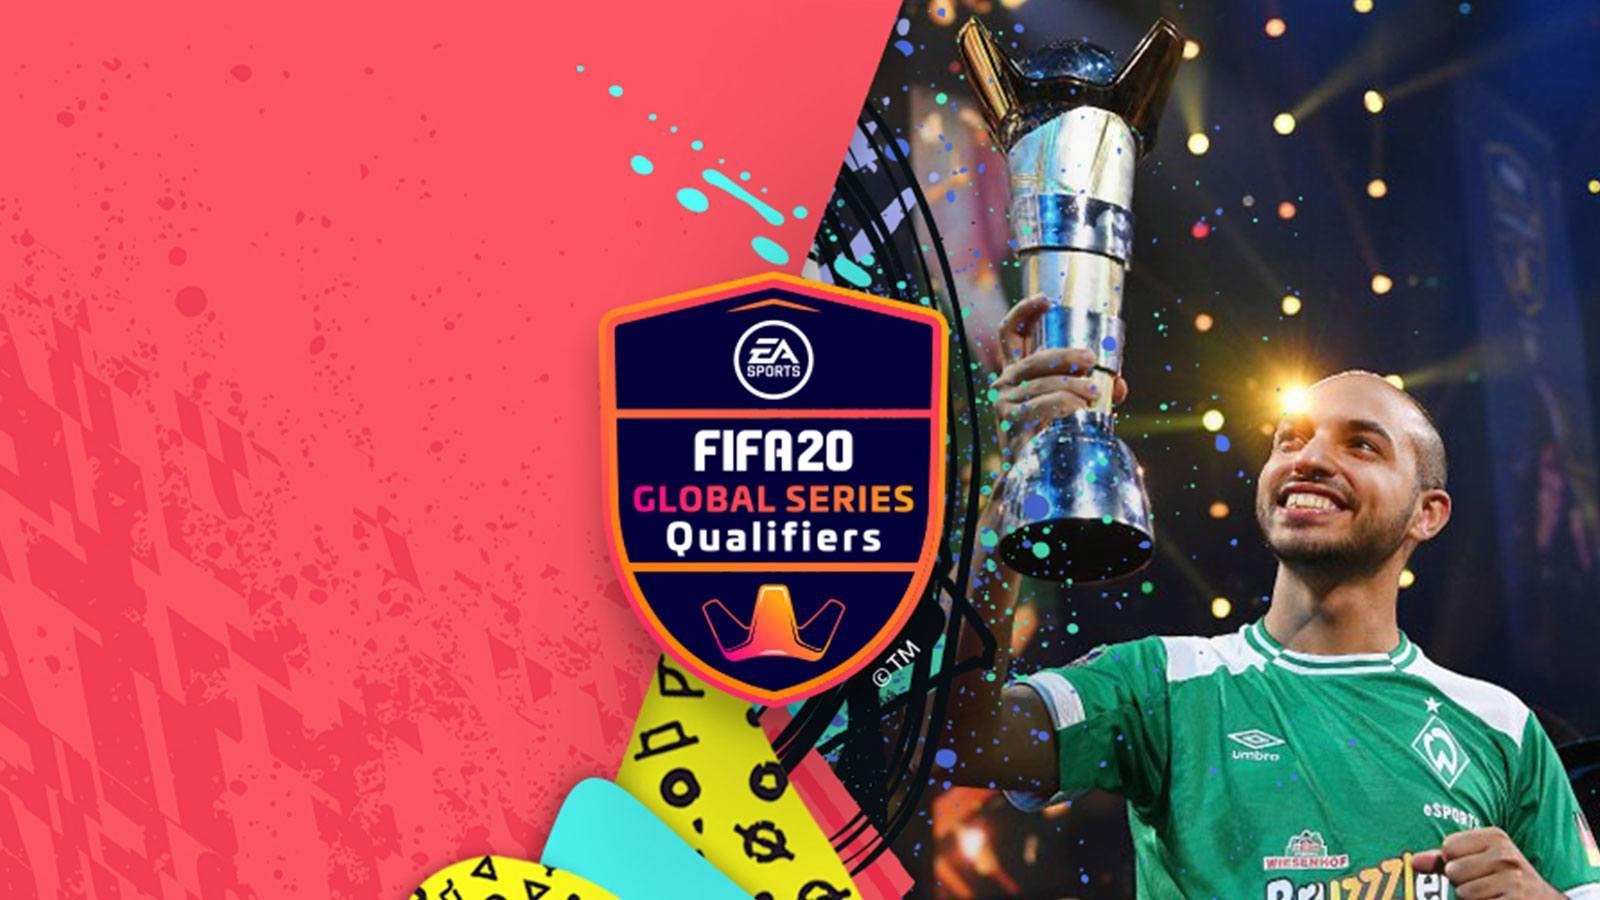 EA Sports FIFA20 Global Series annulés Coronavirus